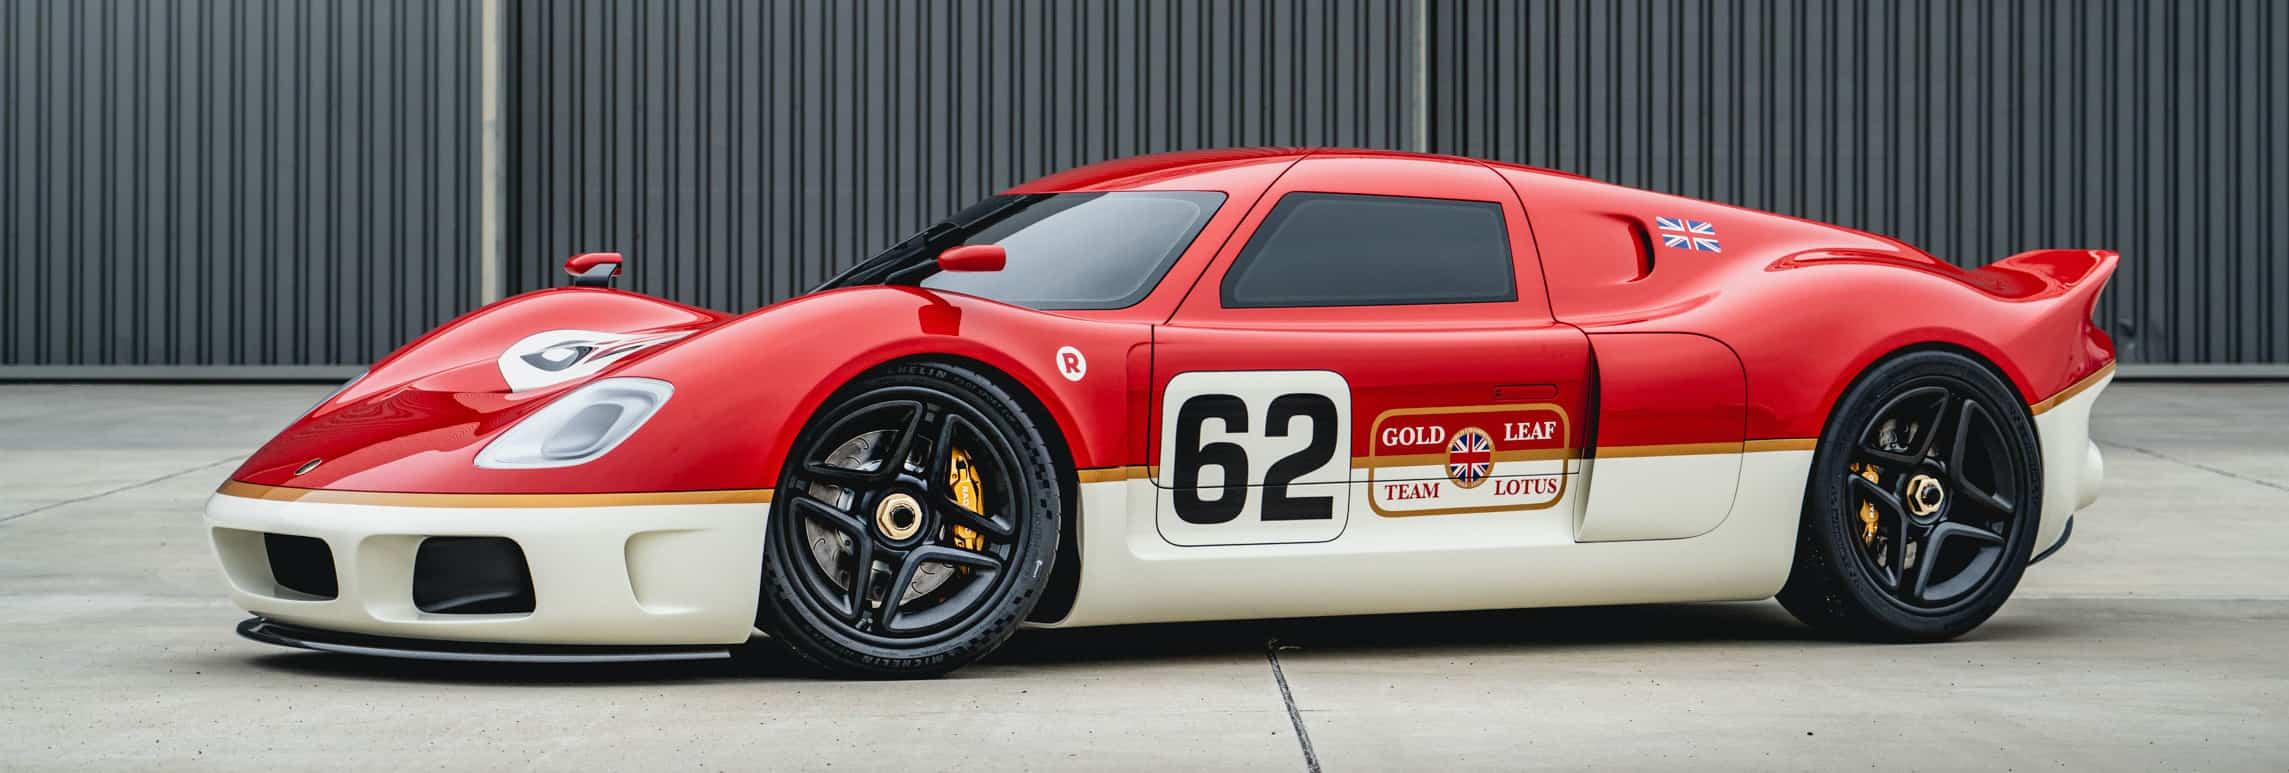 Radford, Radford unveils its version of the Lotus Type 62, ClassicCars.com Journal